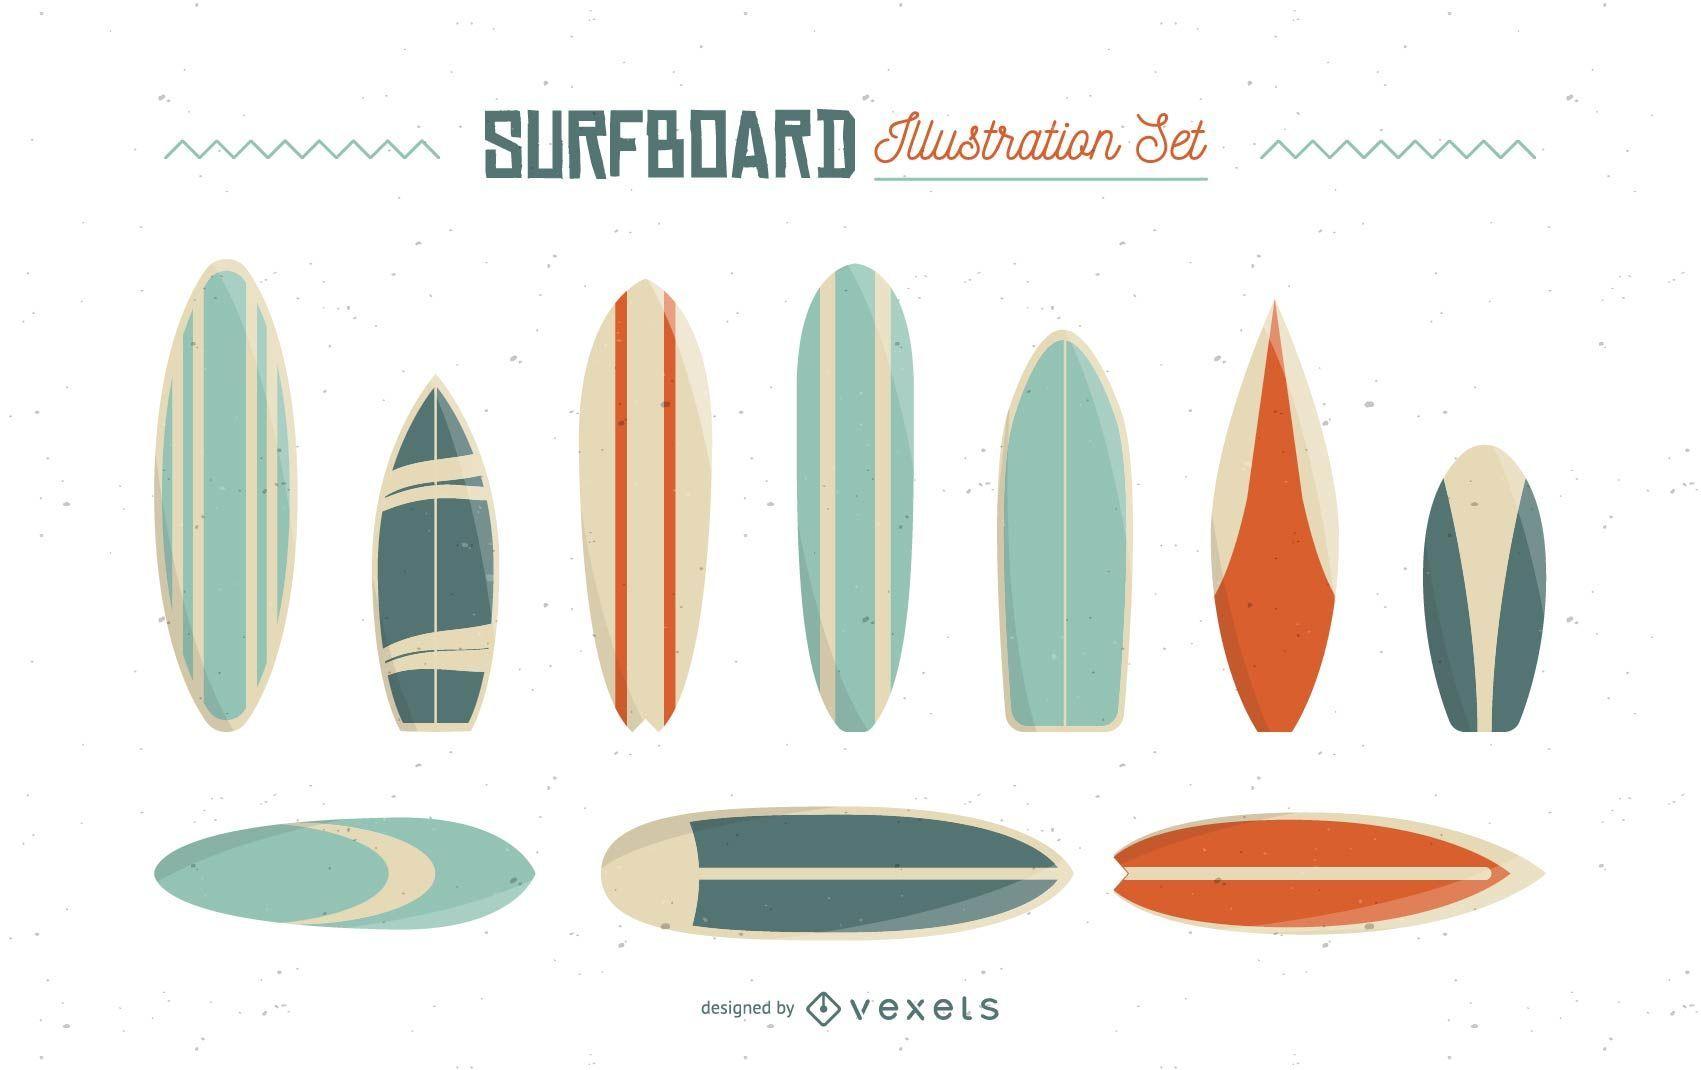 Surfboard Illustration Set